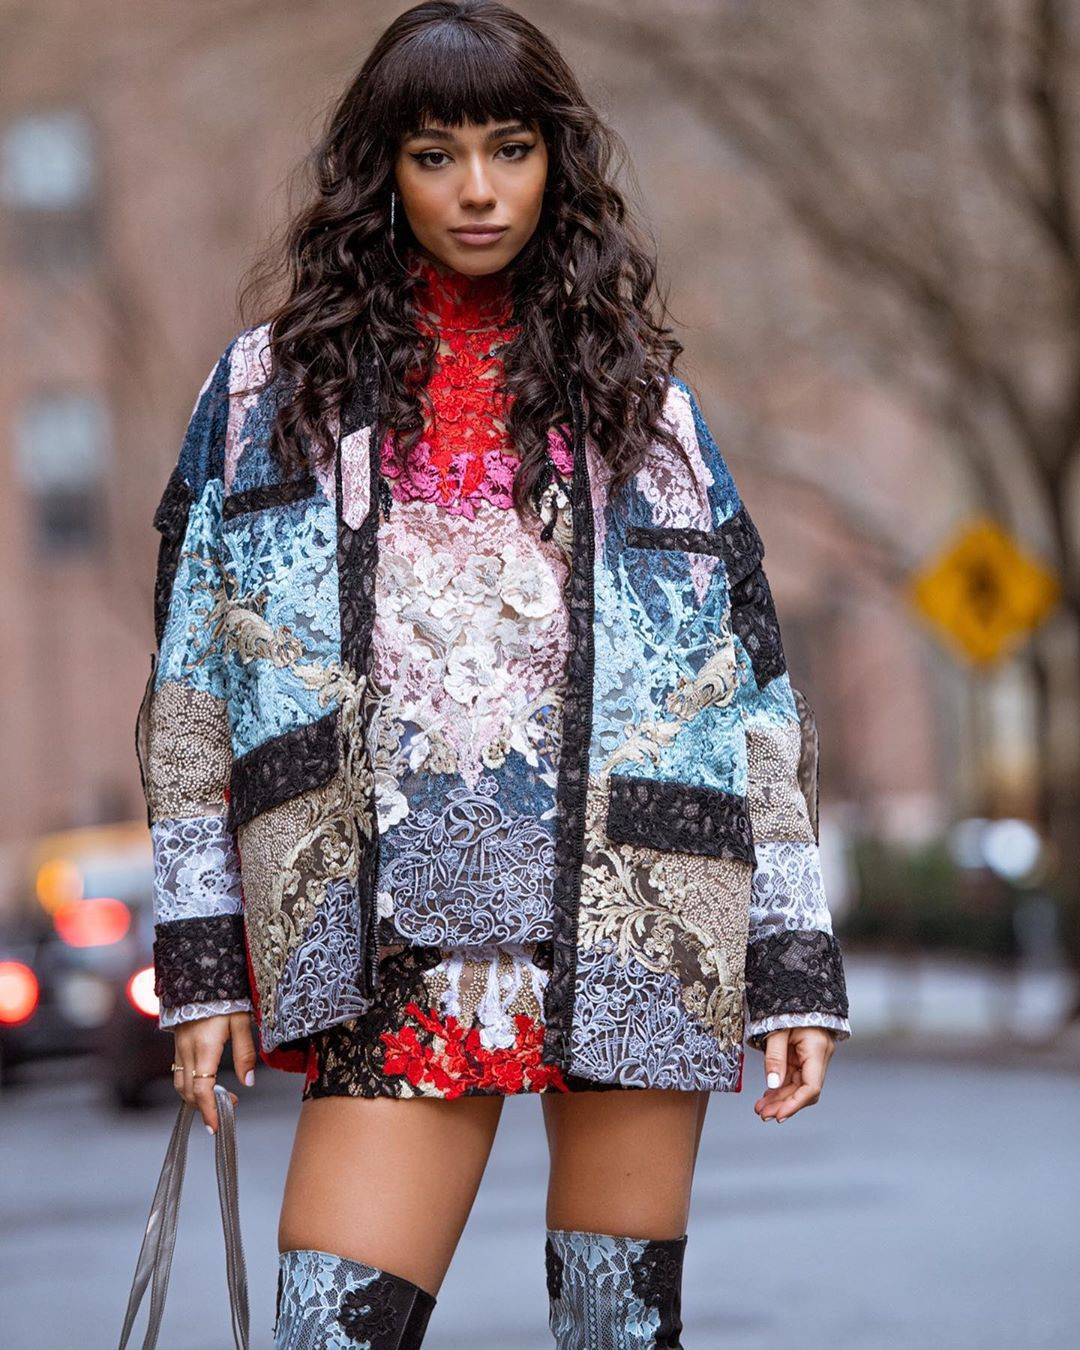 Yovanna Ventura model photography, apparel ideas, street fashion